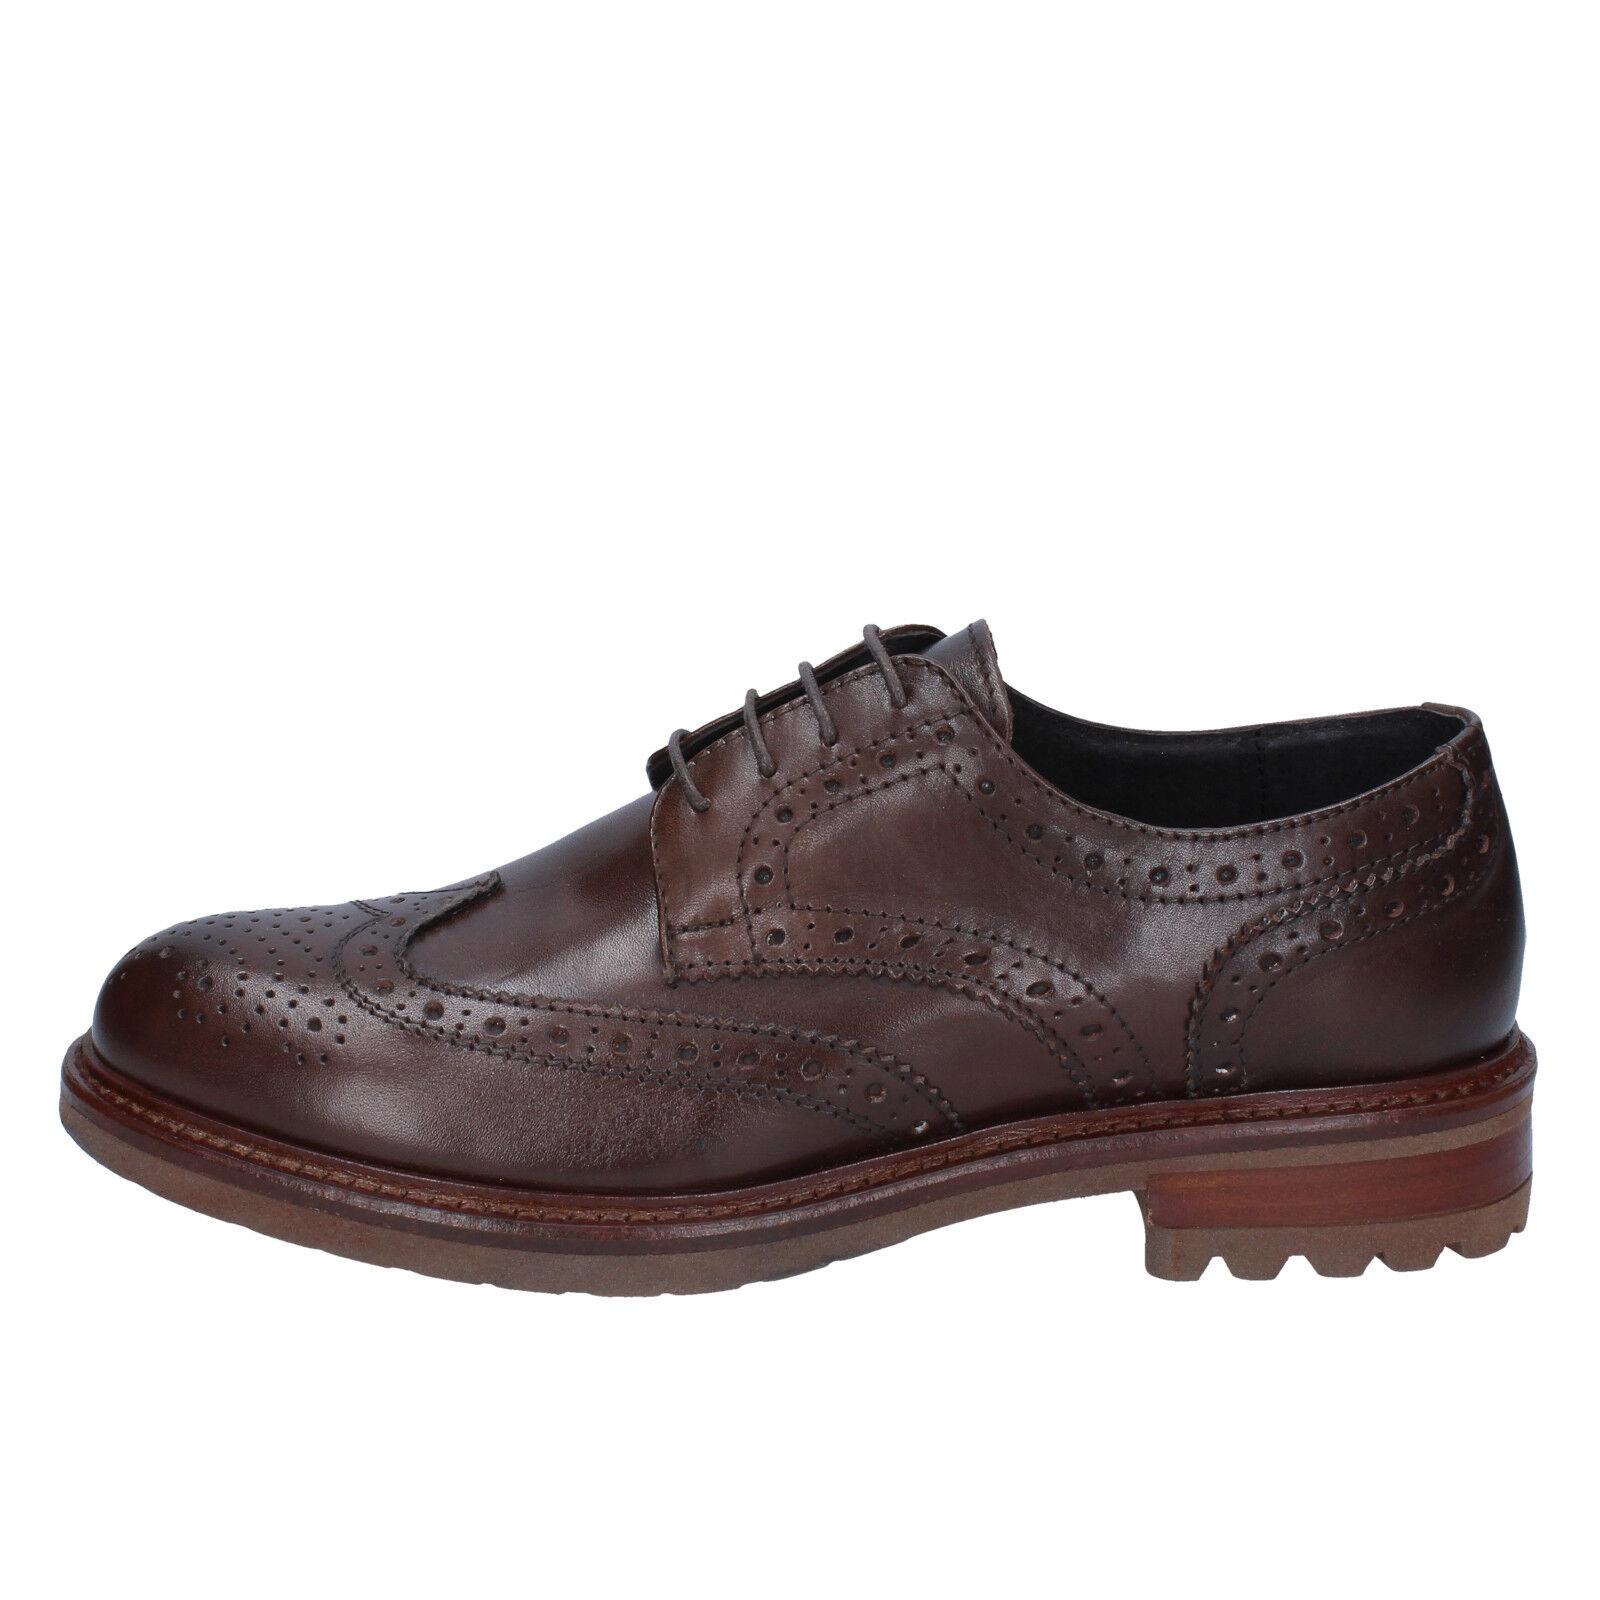 Negozio 2018 Uomo scarpe J. BREITLIN 11 11 11 (EU 44) elegant Marrone leather BX212-44  prendi l'ultimo